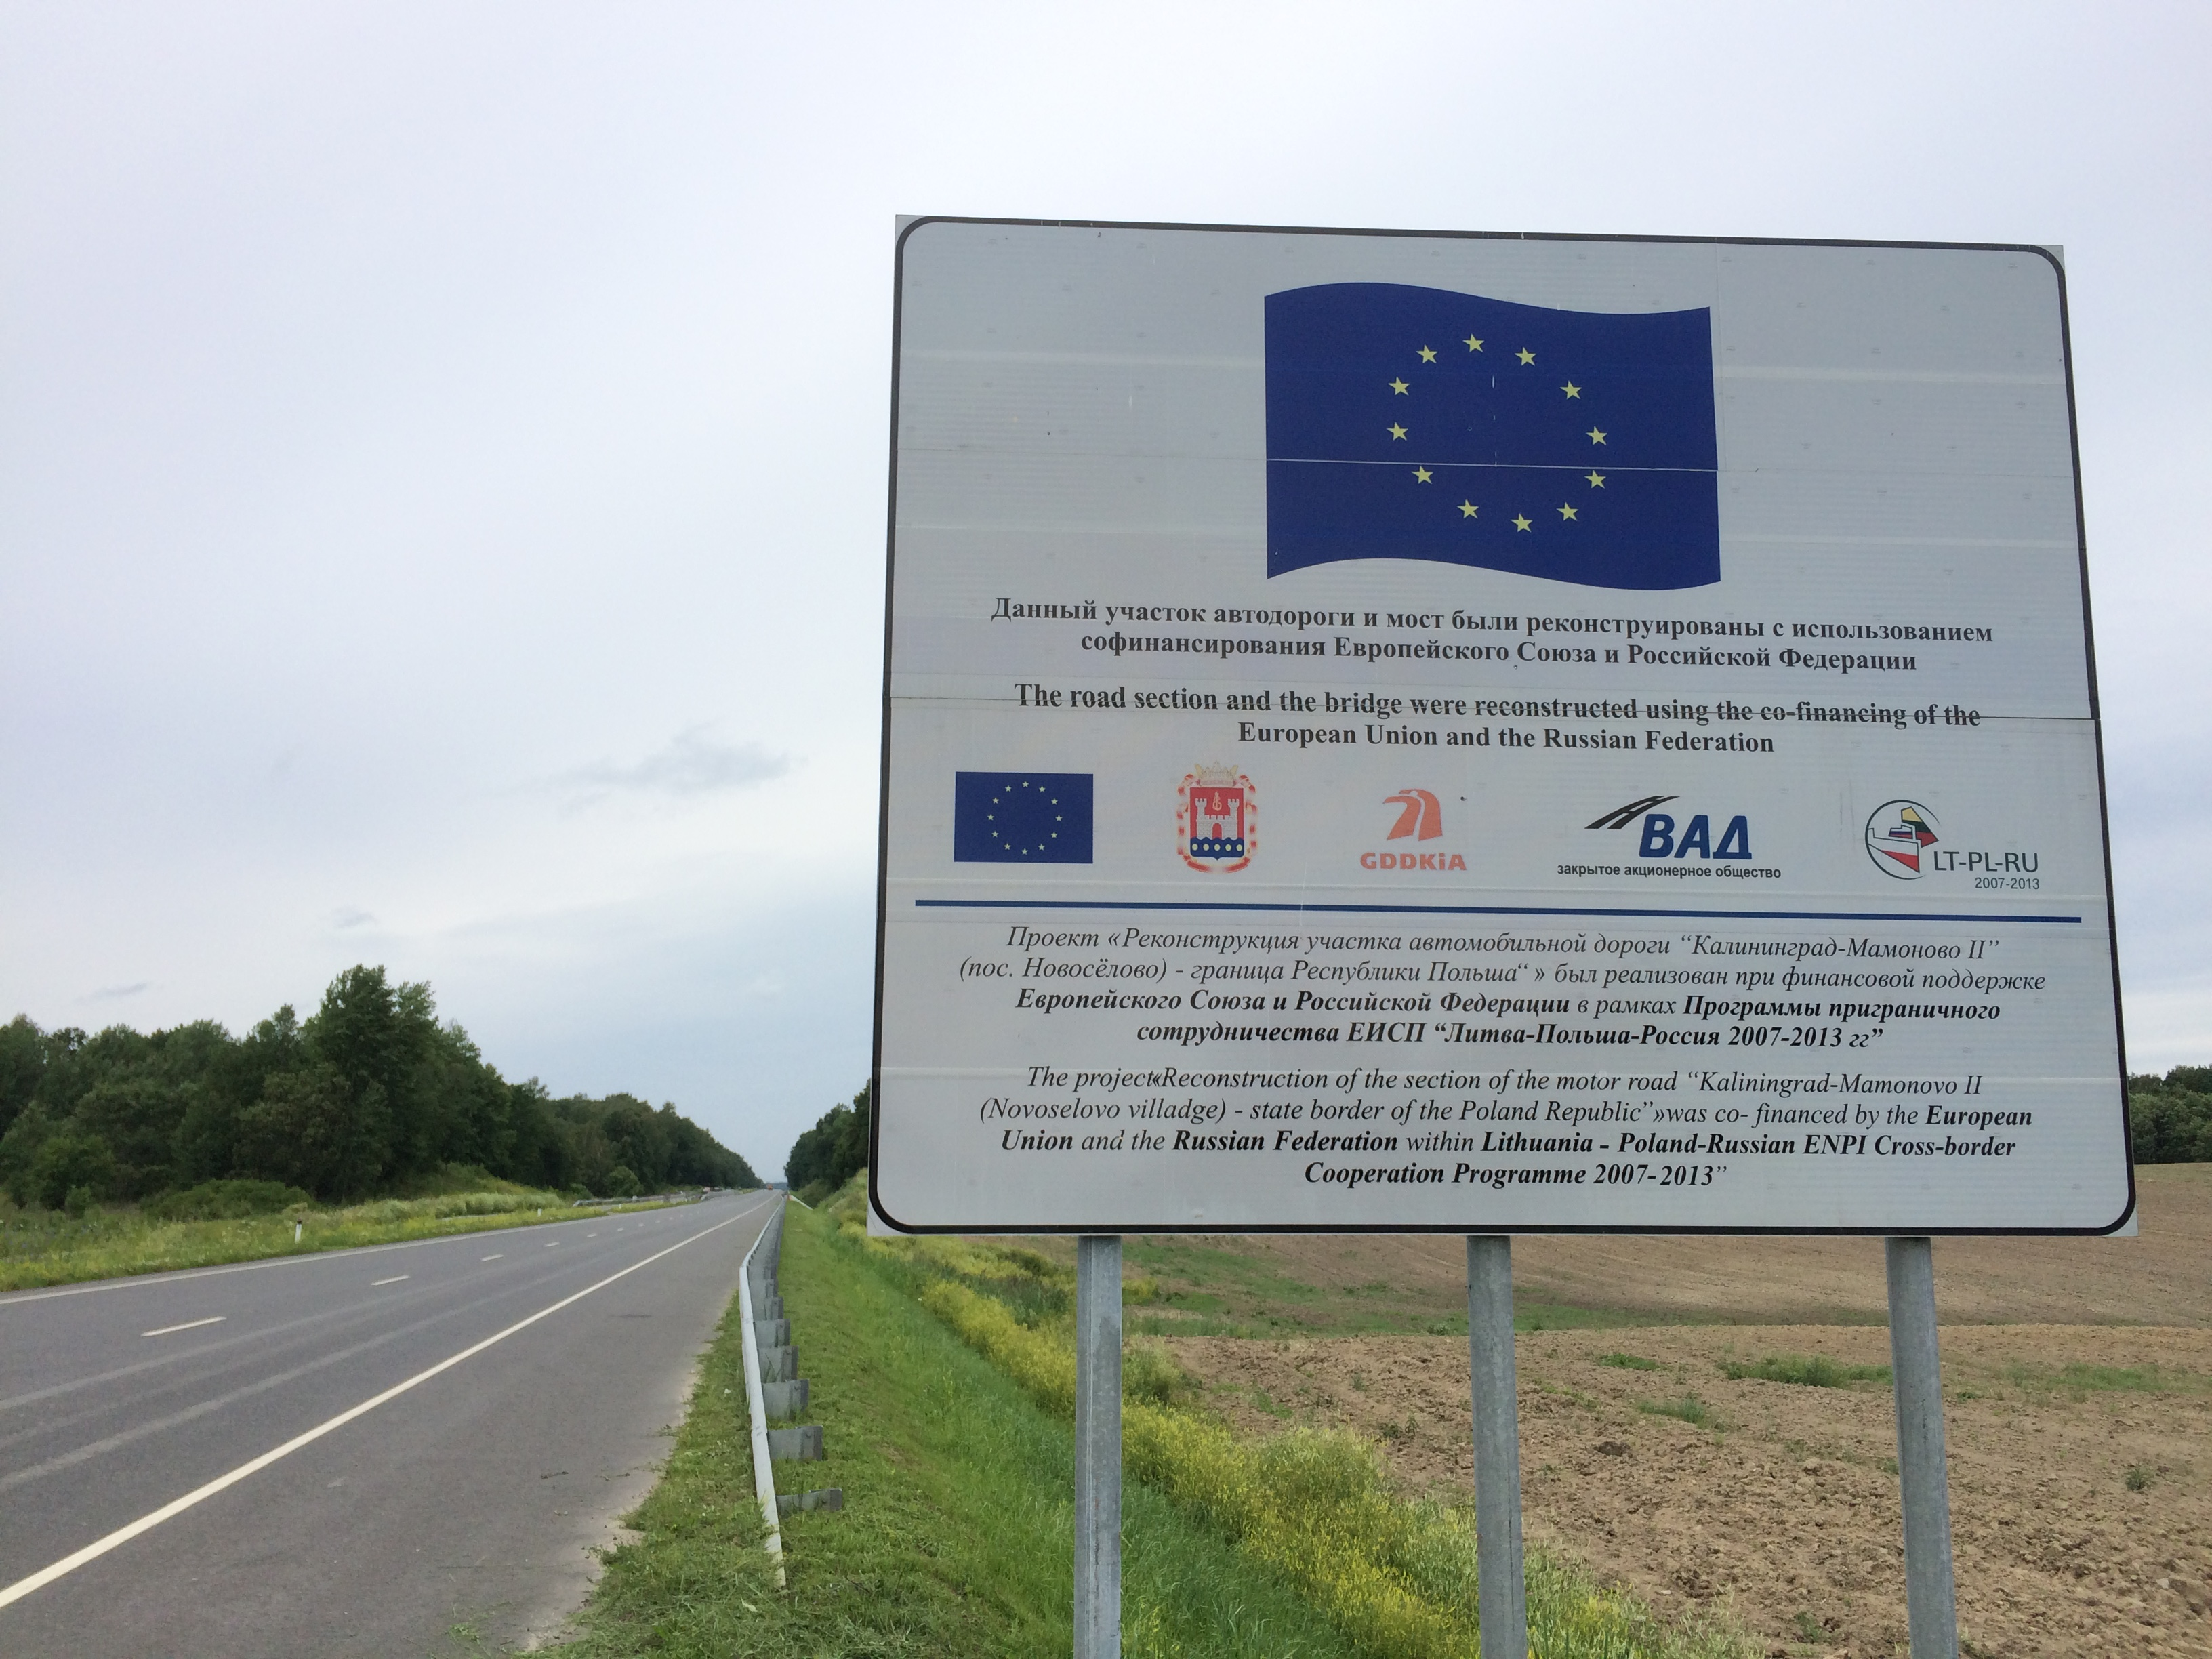 grens rusland polen